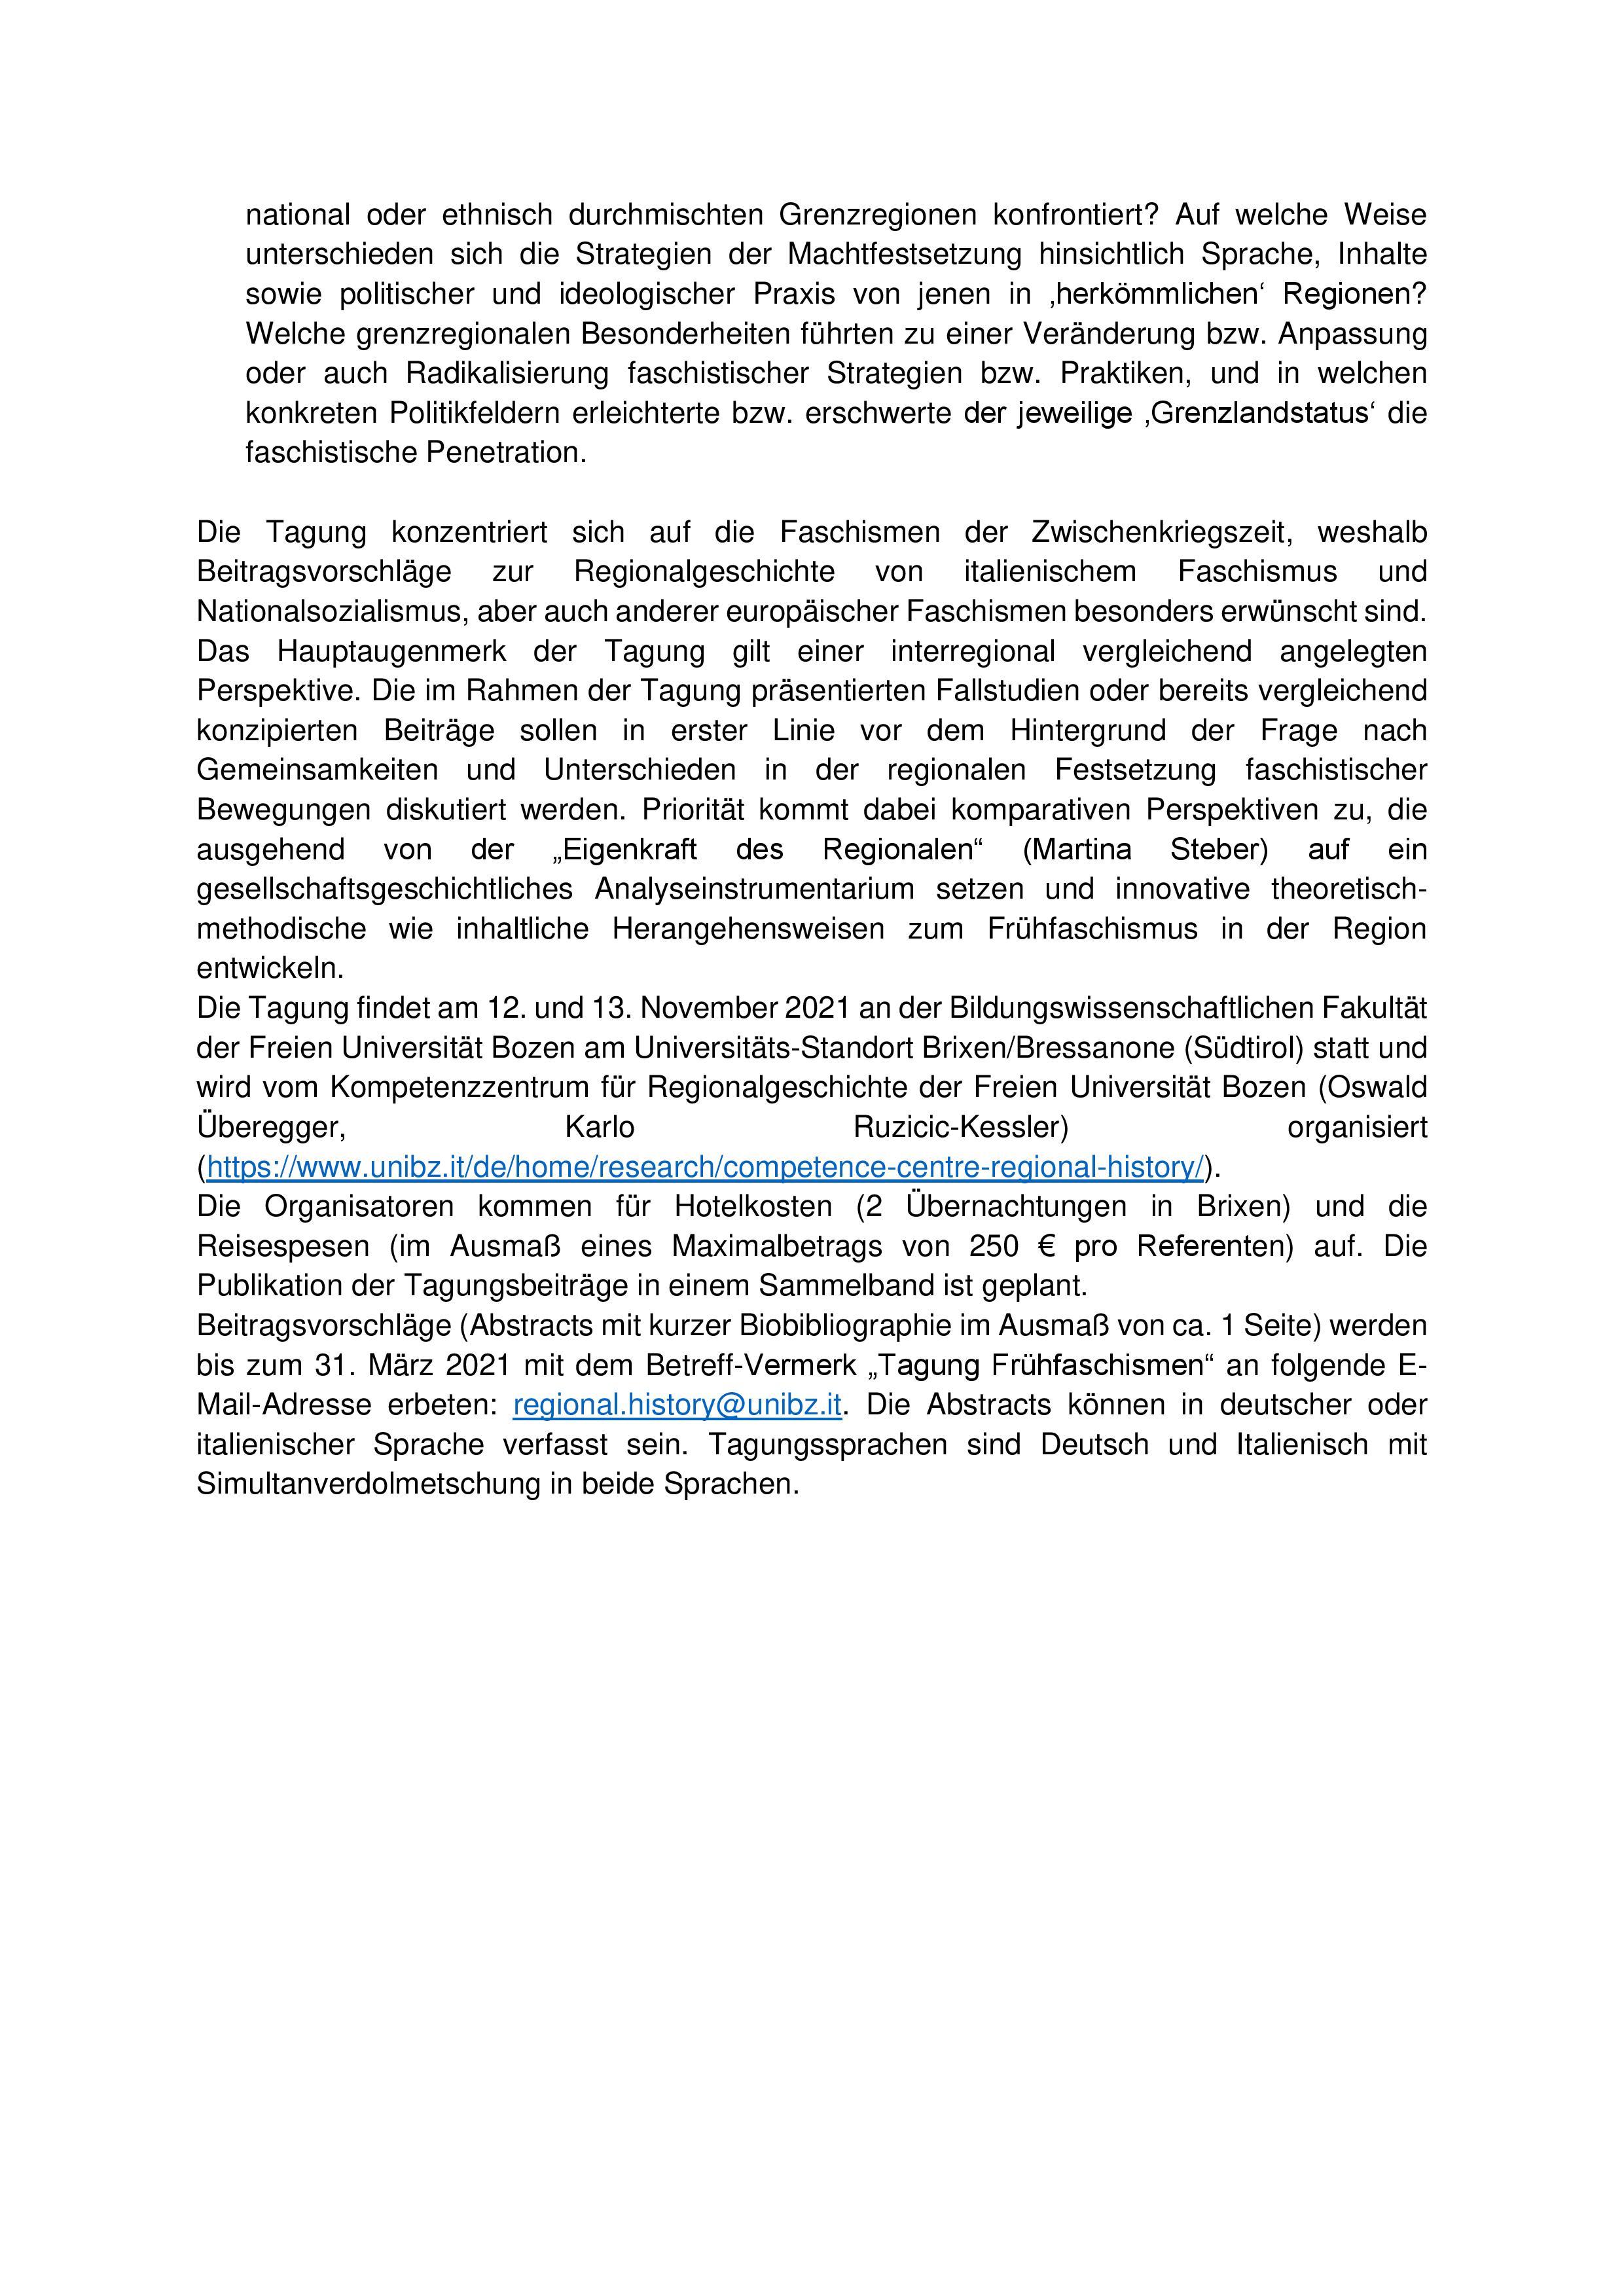 CfP_Fruehfaschismen (1)-page-003